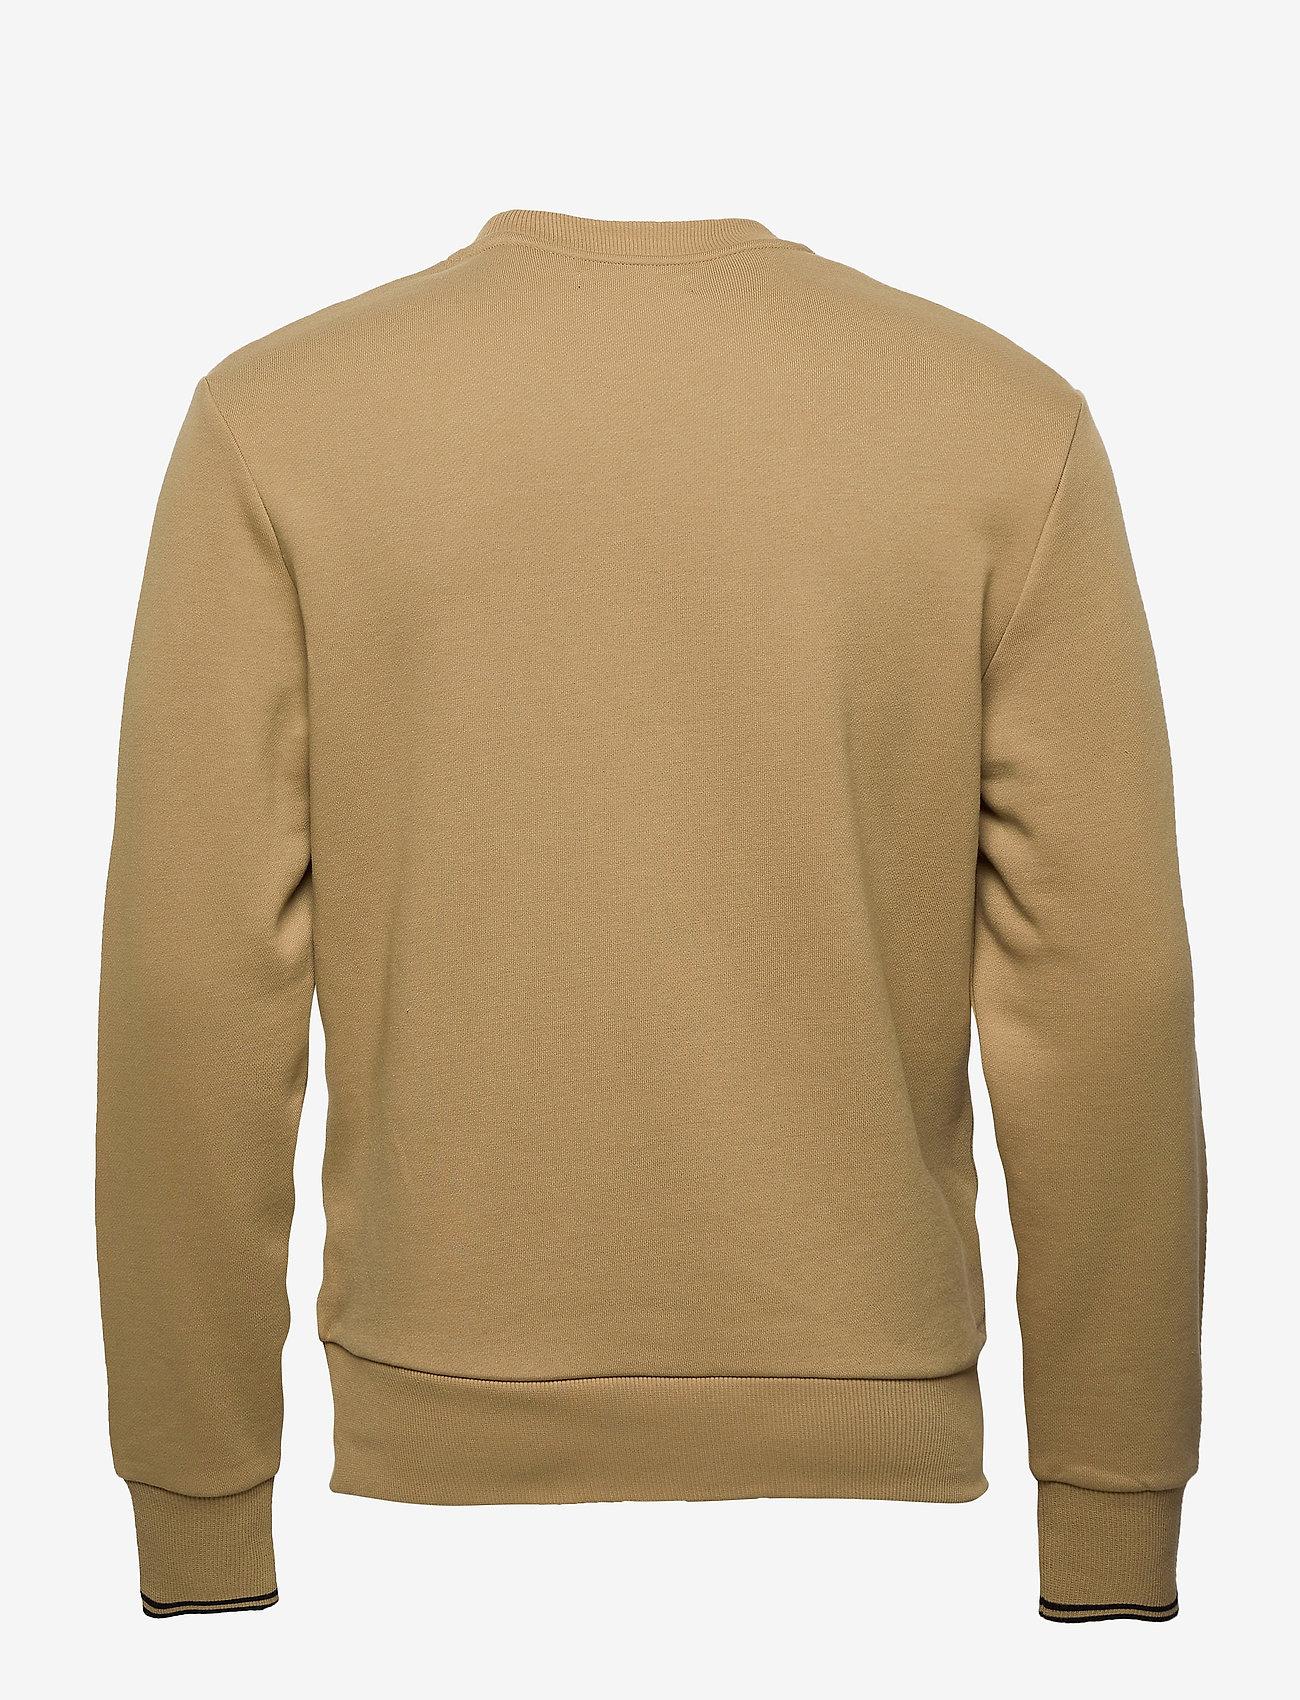 Fred Perry CREW NECK SWEATSHIRT - Sweatshirts WARM STONE - Menn Klær